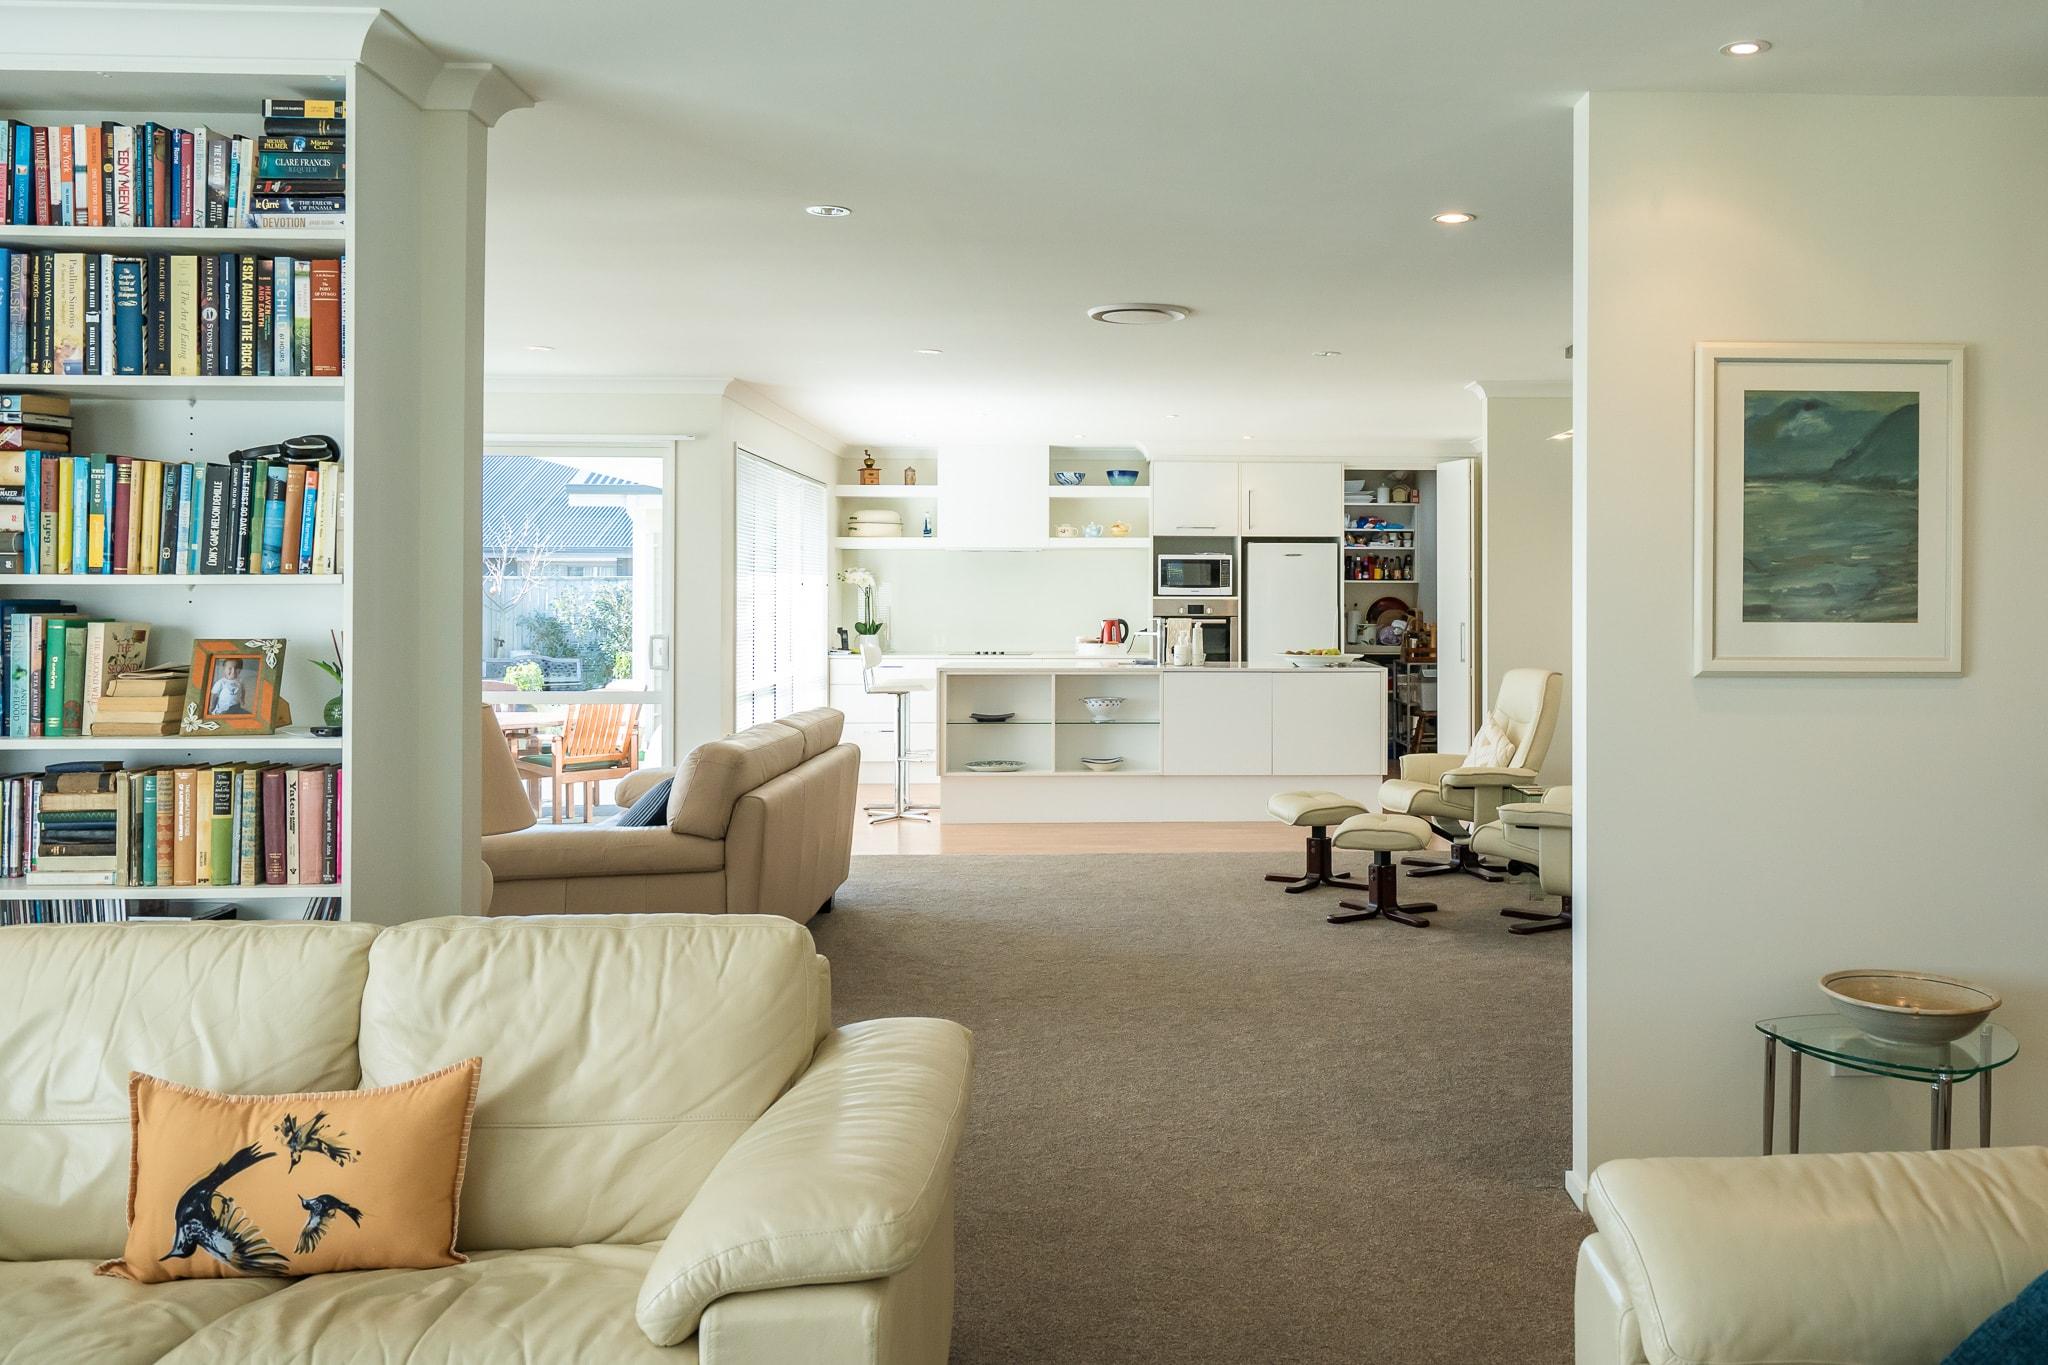 robertson_building_canterbury_ltd_ballarat_small_65-min.jpg